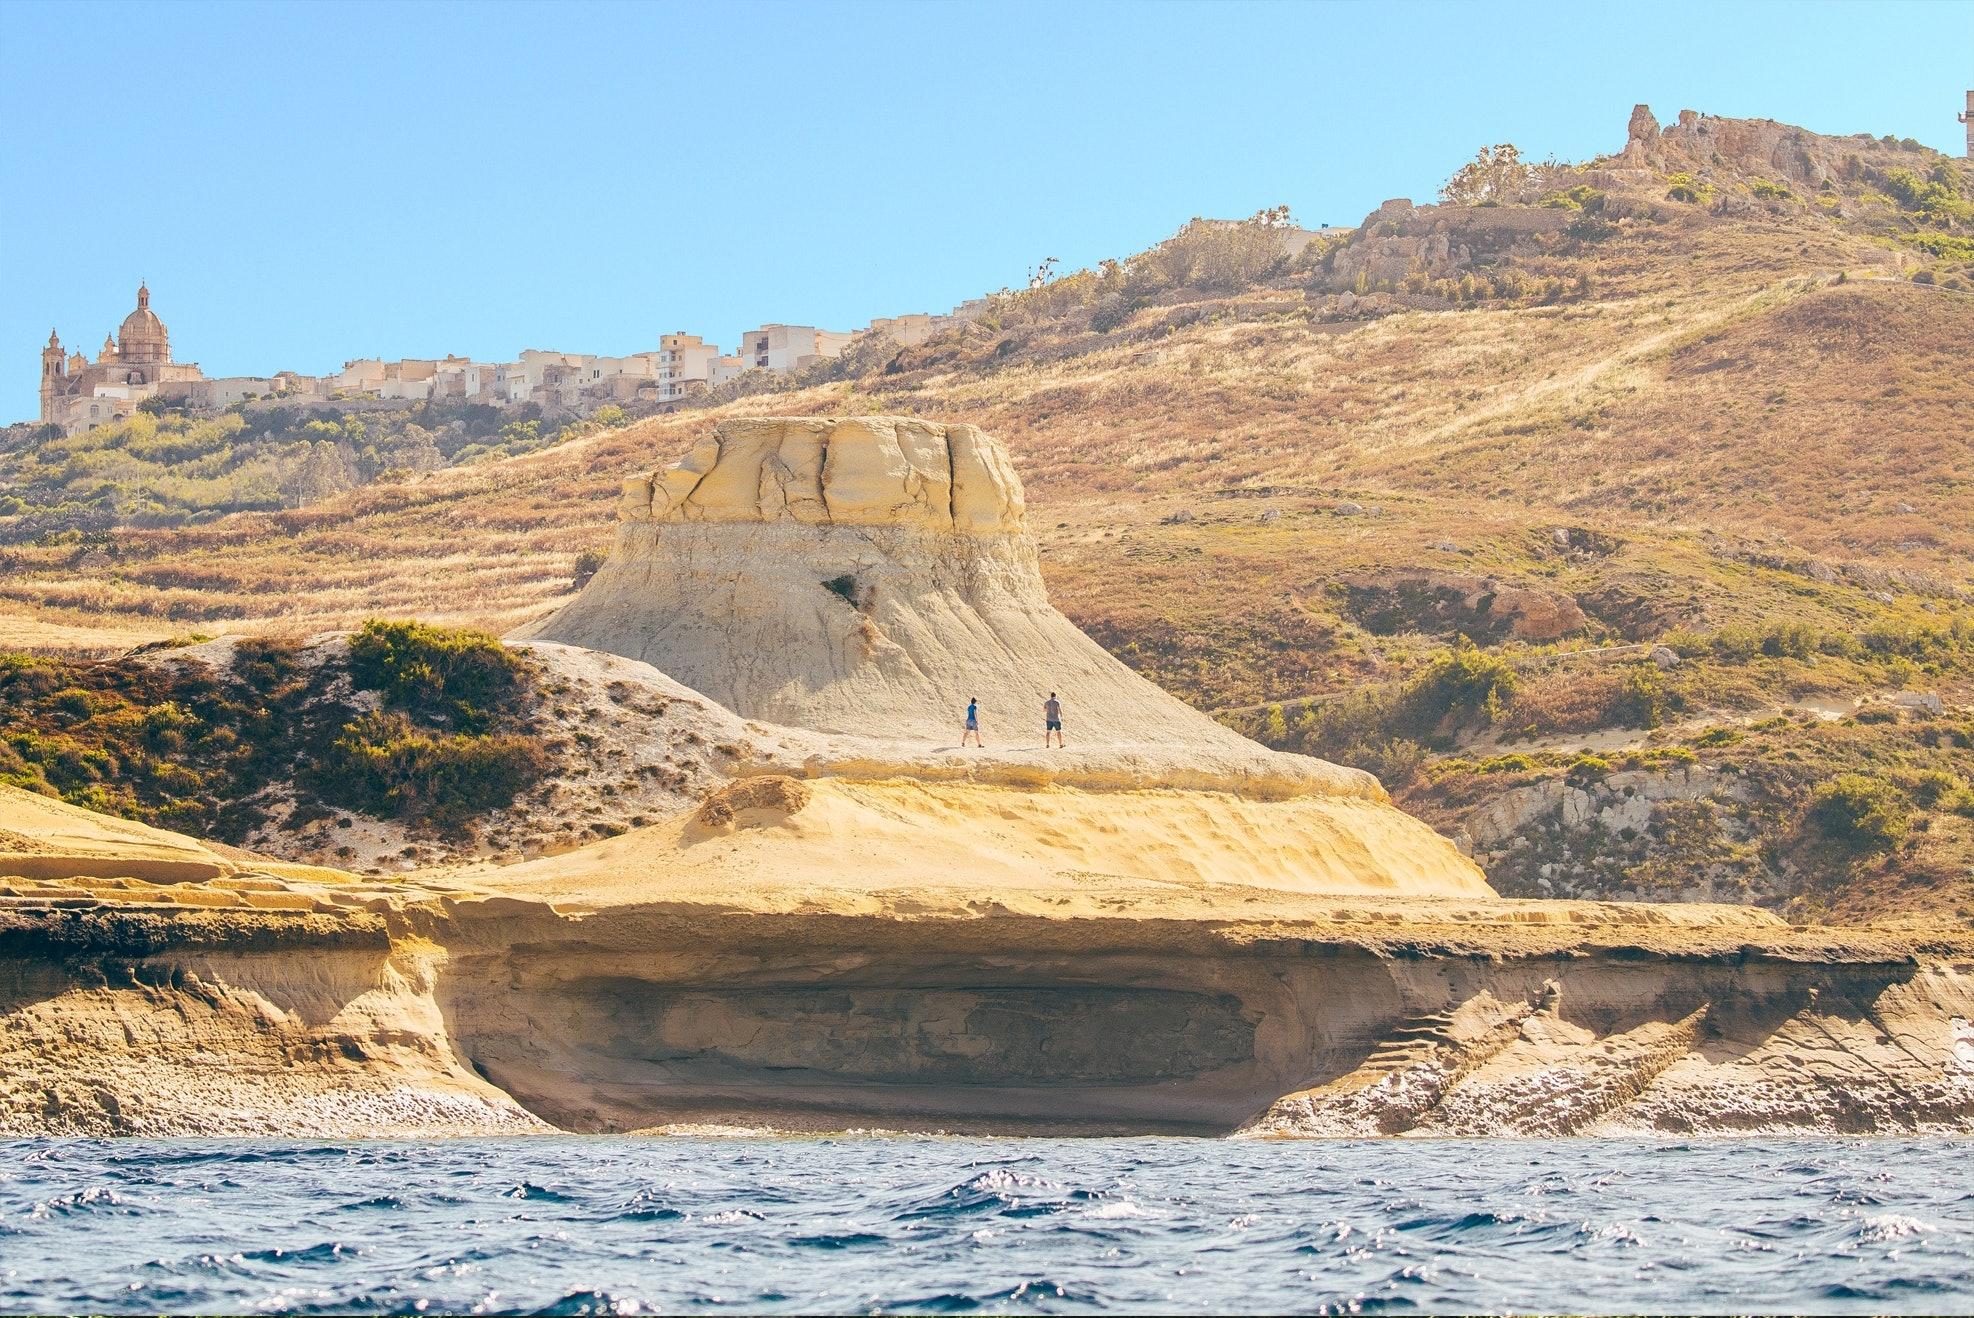 Blick auf steinige Felsenklippe in Malta.